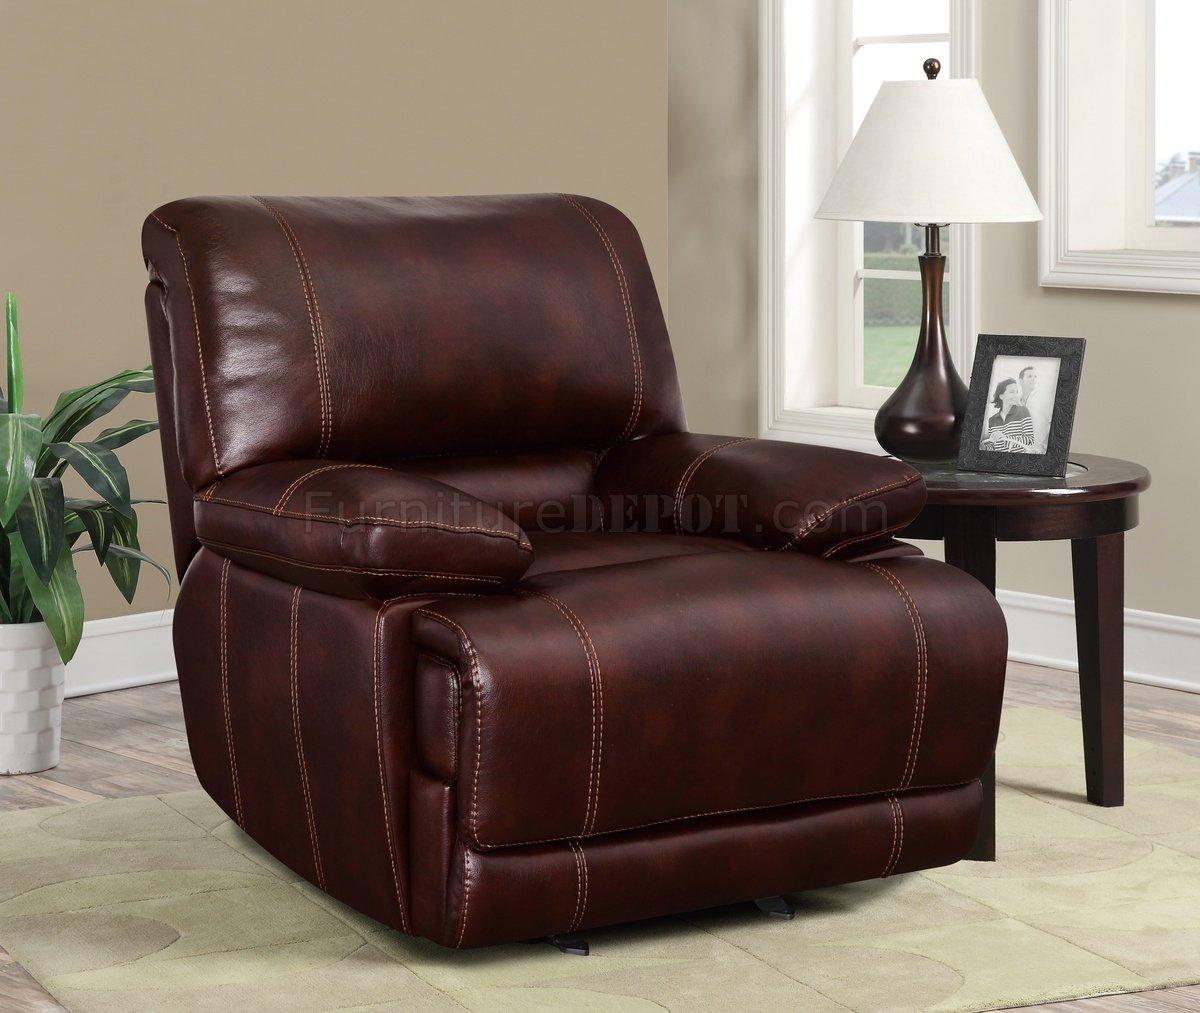 espresso bonded leather reclining sofa loveseat set snuggle bed u1953 in coffee global